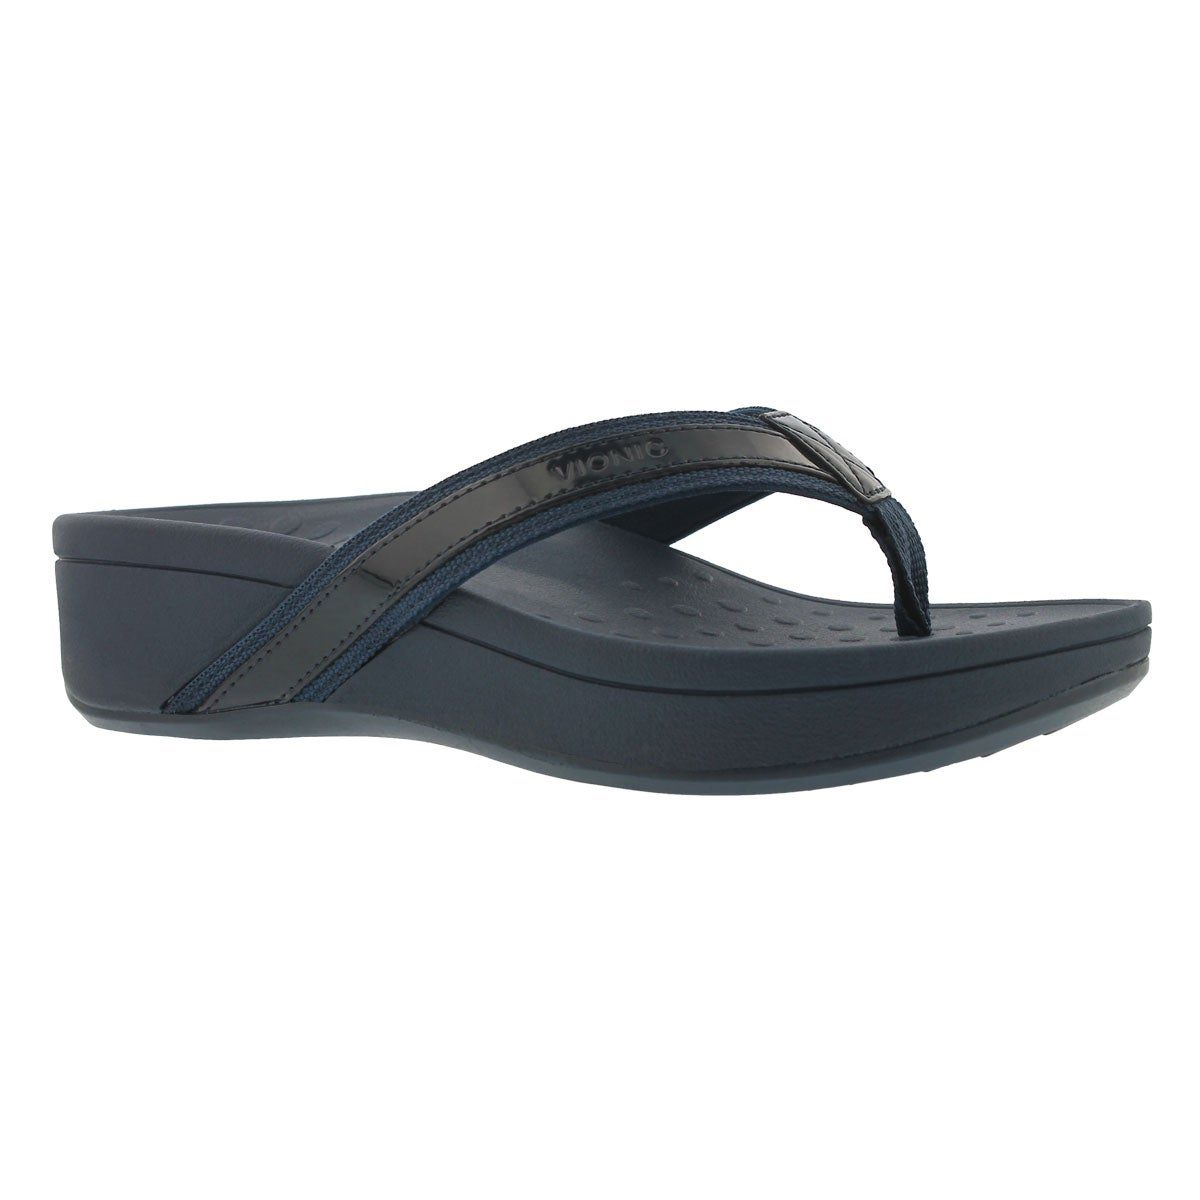 Women's HIGH TIDE navy arch support wdg sandals